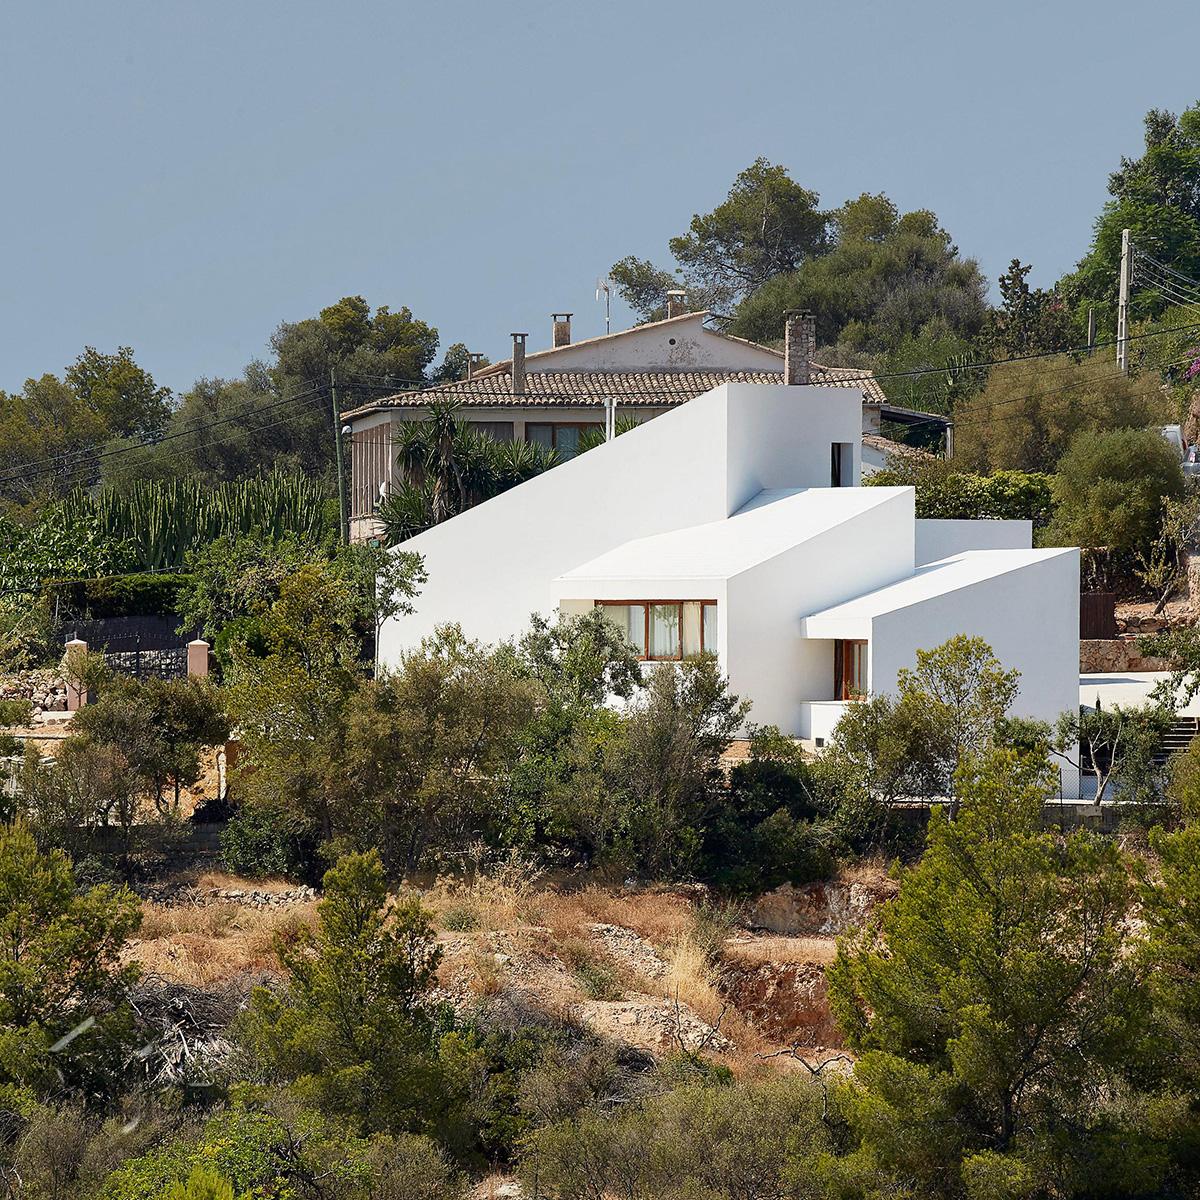 01-casa-mm-ohlab-oliver-hernaiz-architecture-lab-foto-jose-hevia